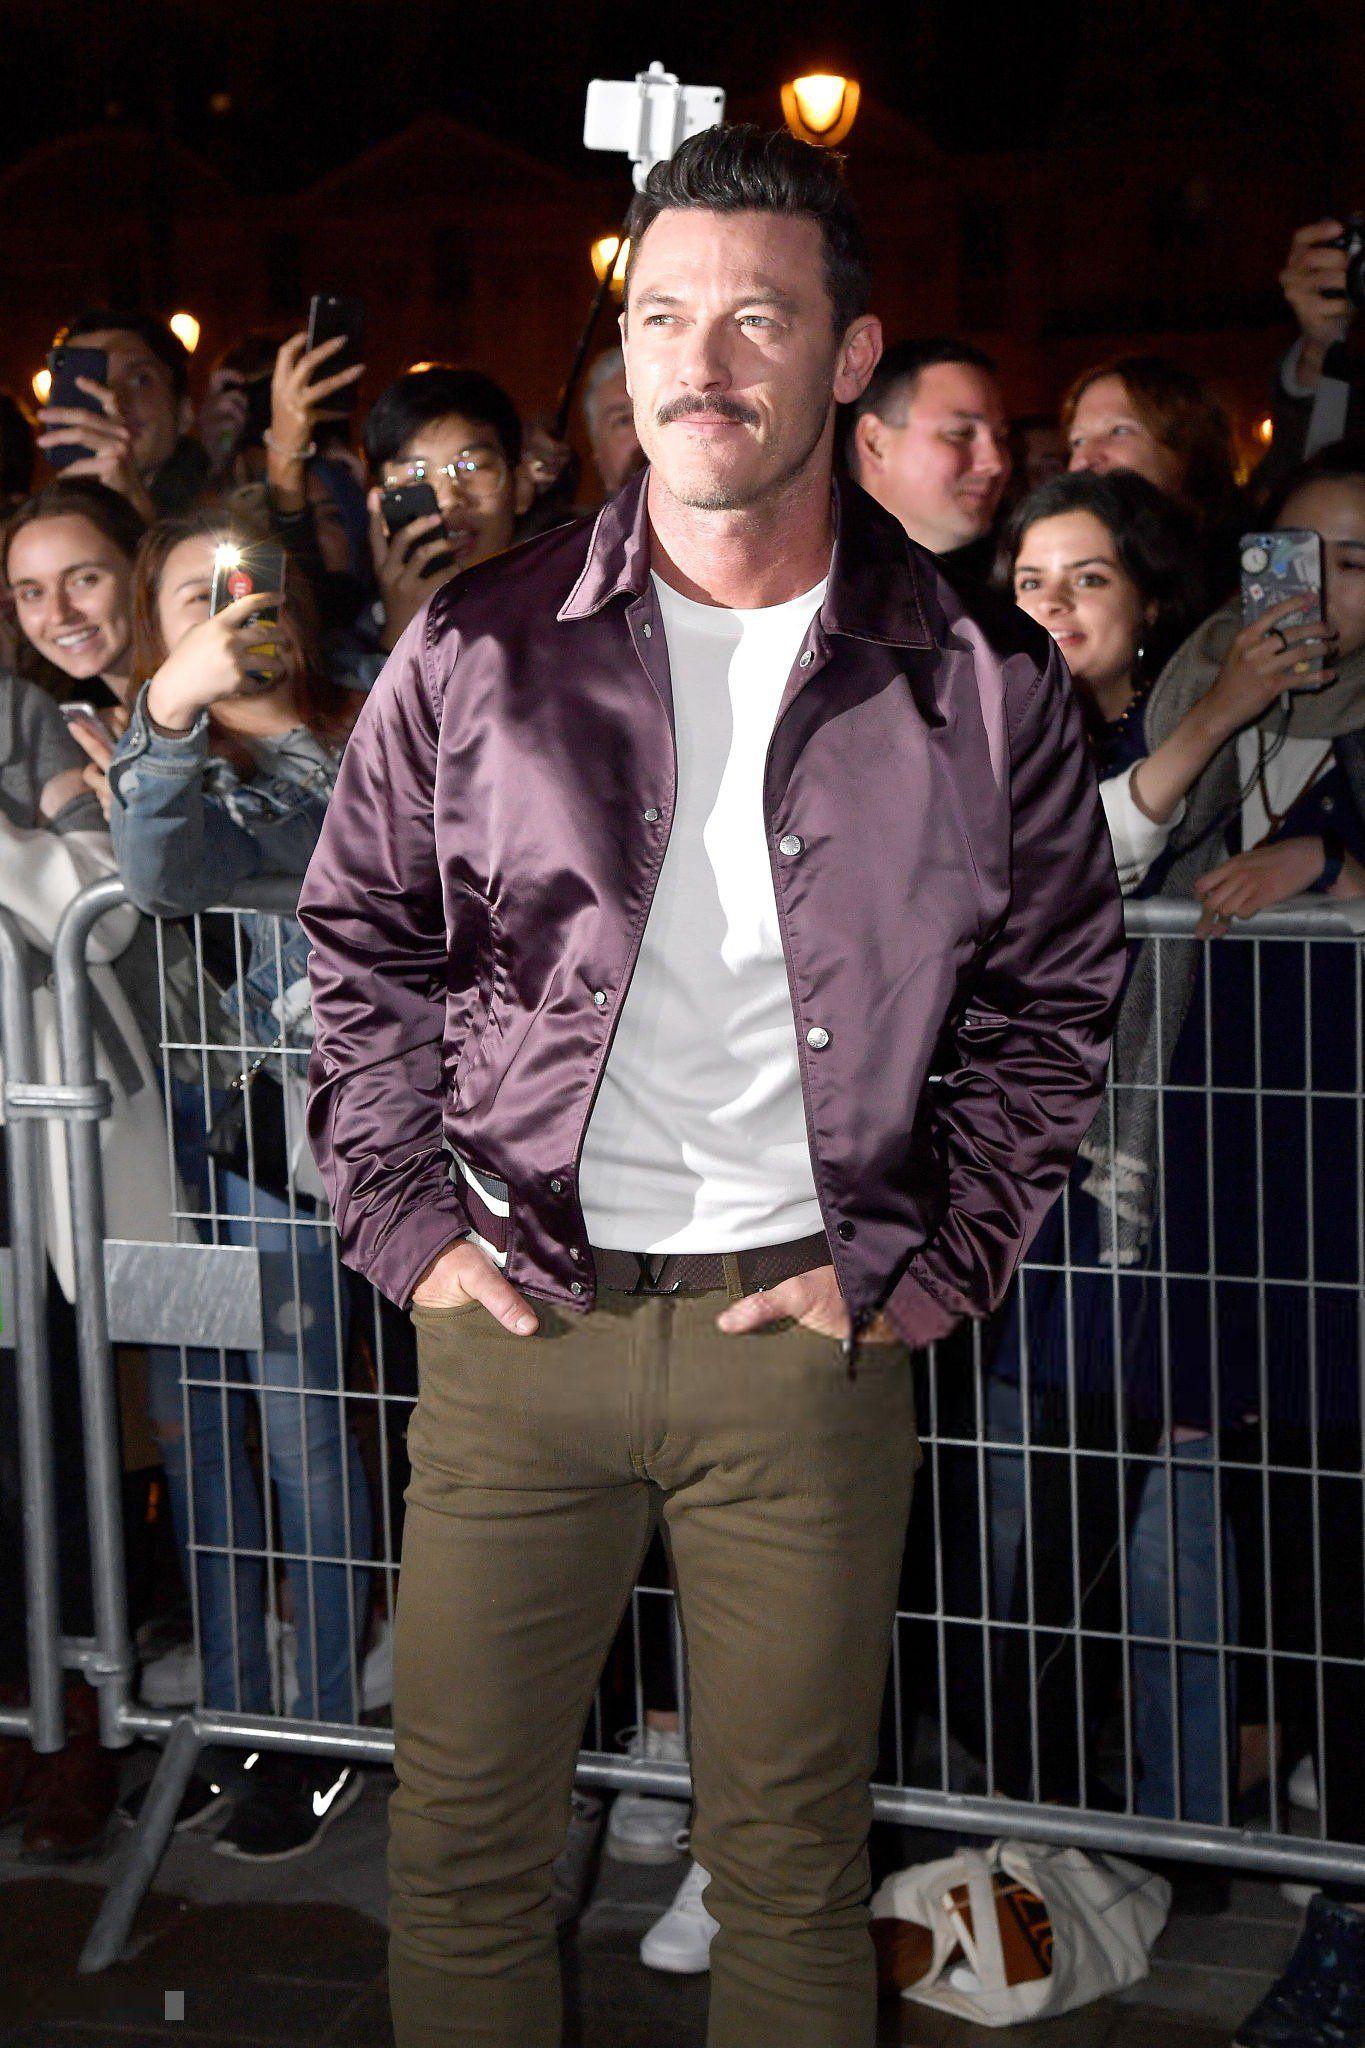 Pin By Rebecca White Shifflet On Luke Evans Obsession Luke Evans Celebrities Male To My Future Husband